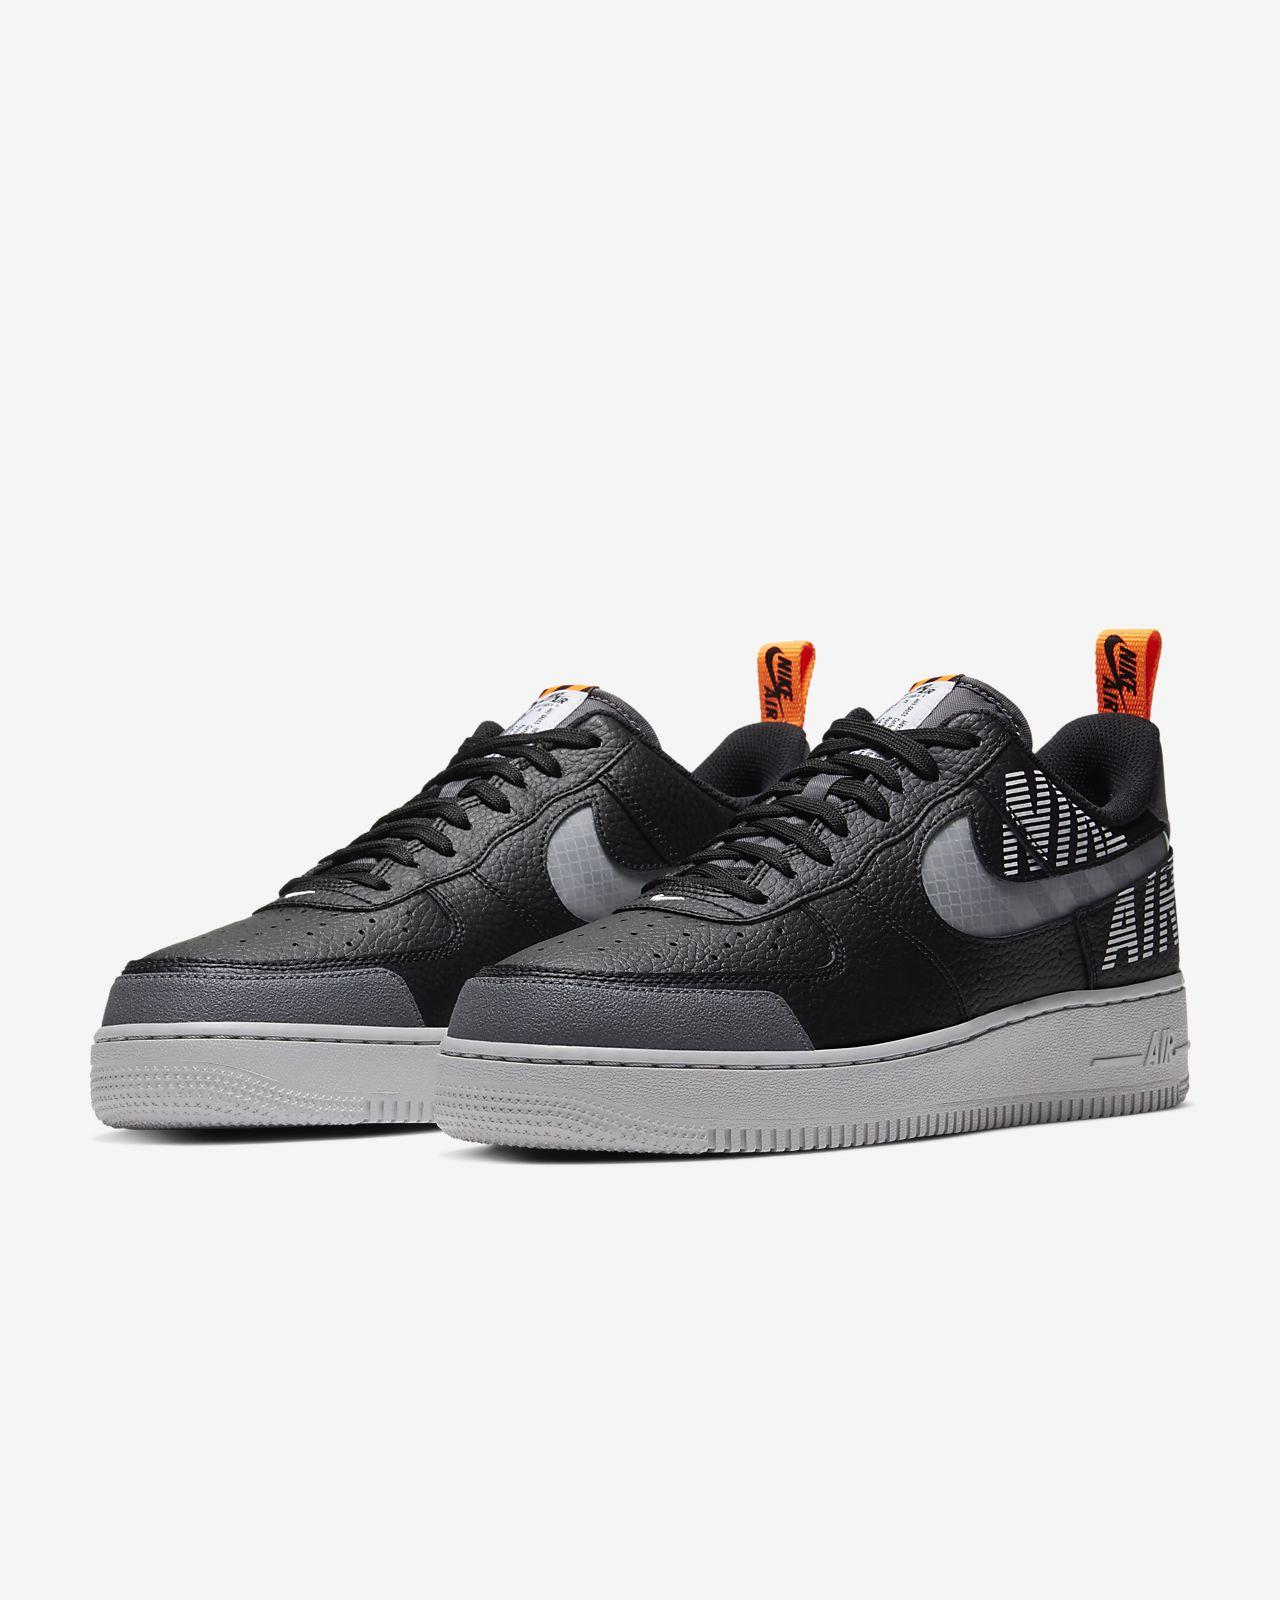 Nike Air Force 1 '07 Lv8 1 Sneaker For Men Grey & Black